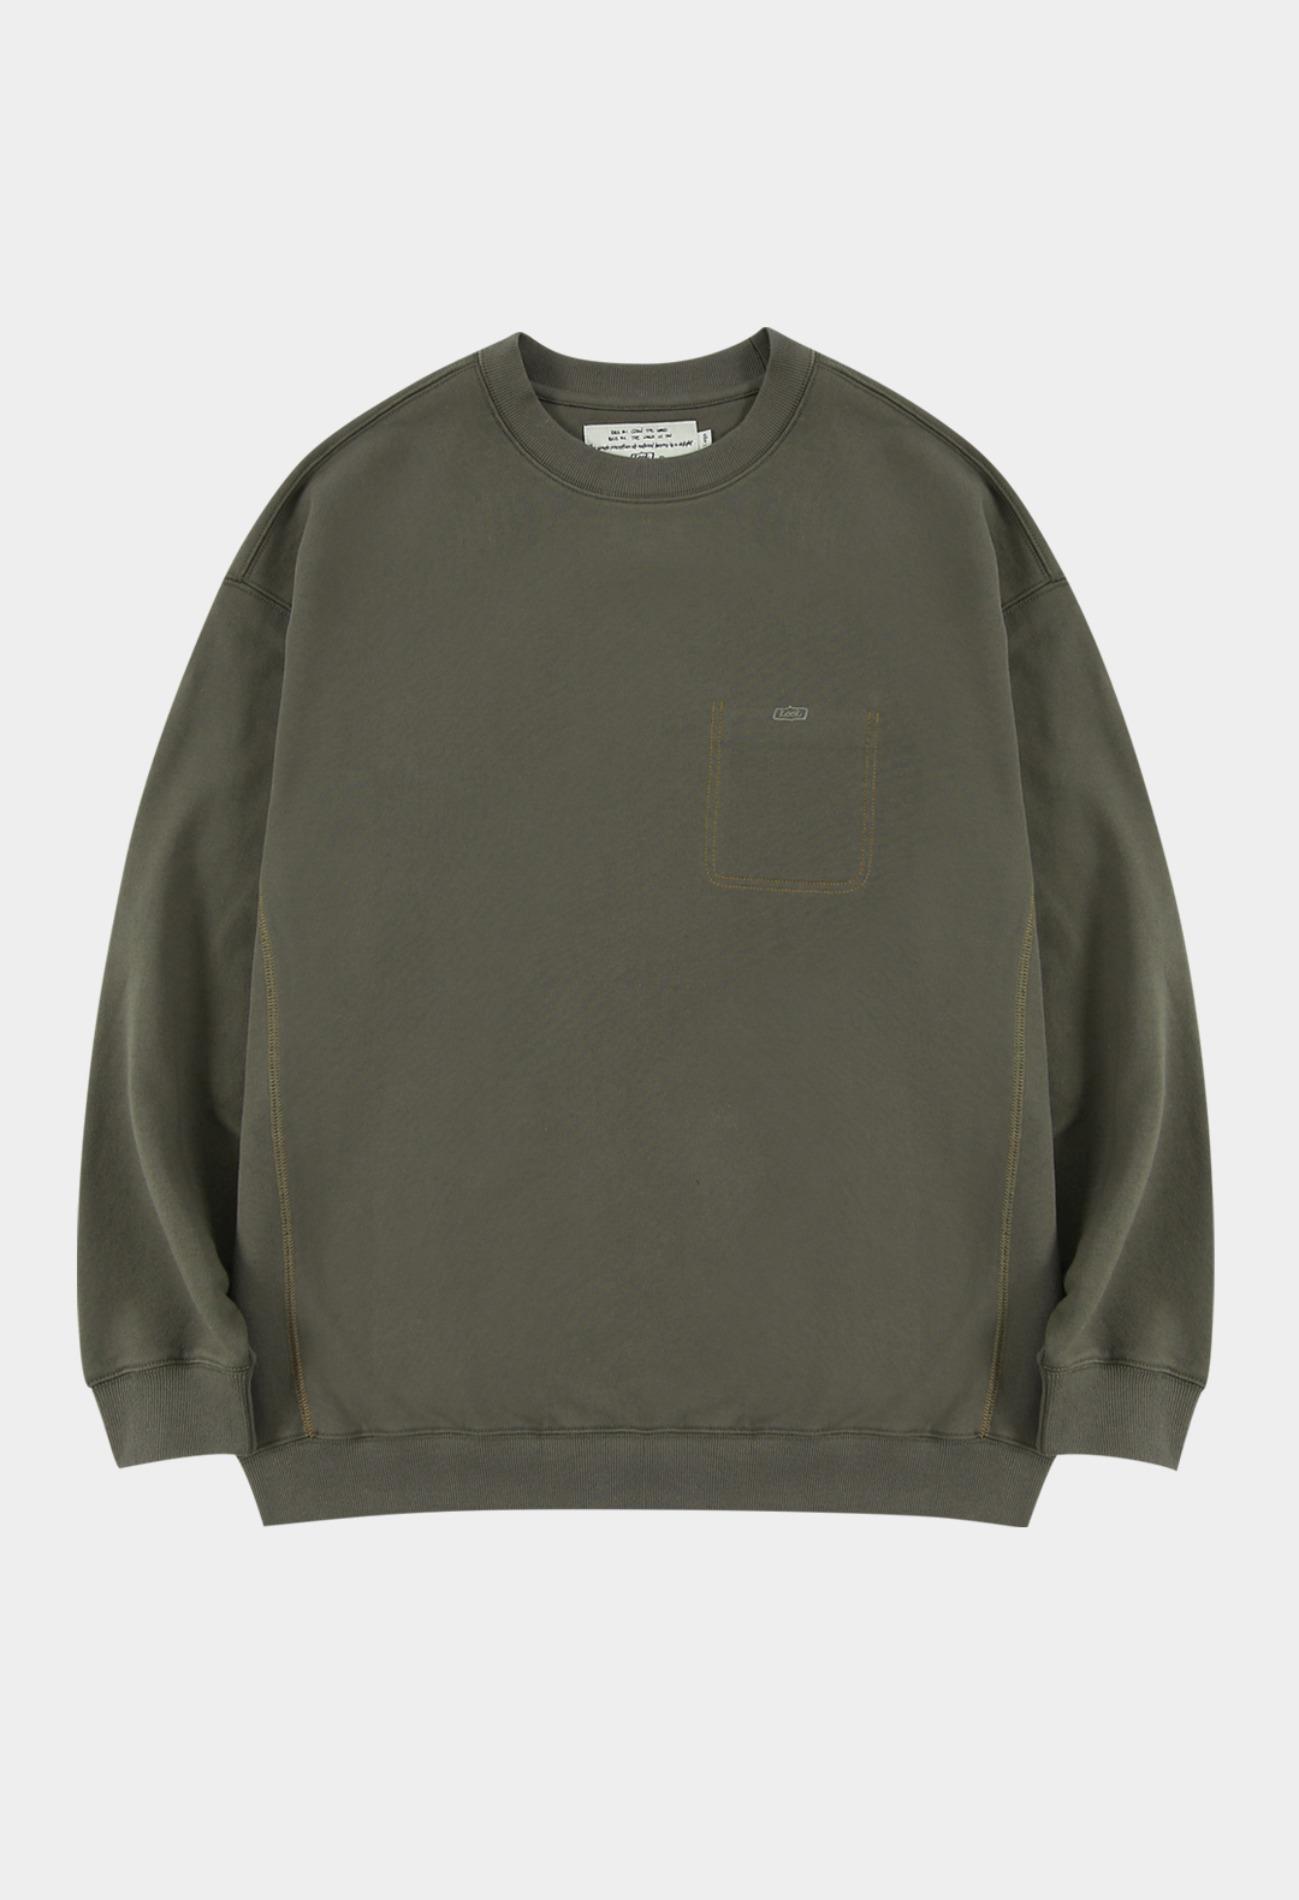 keek Stitich pocket sweatshirts - Vintage brown 스트릿패션 유니섹스브랜드 커플시밀러룩 남자쇼핑몰 여성의류쇼핑몰 후드티 힙색